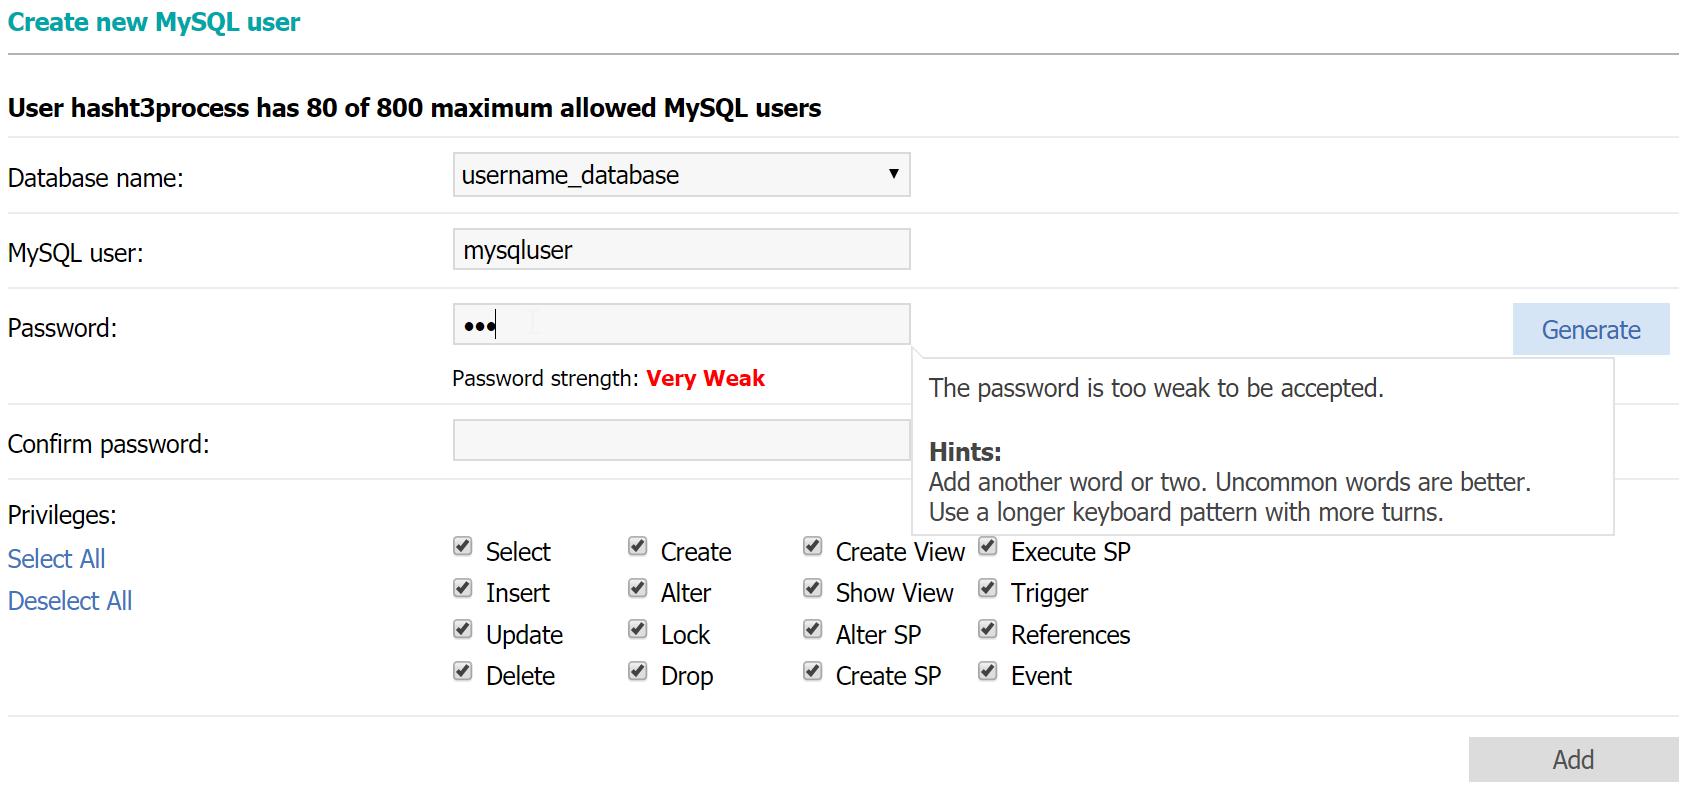 Create new MySQL user